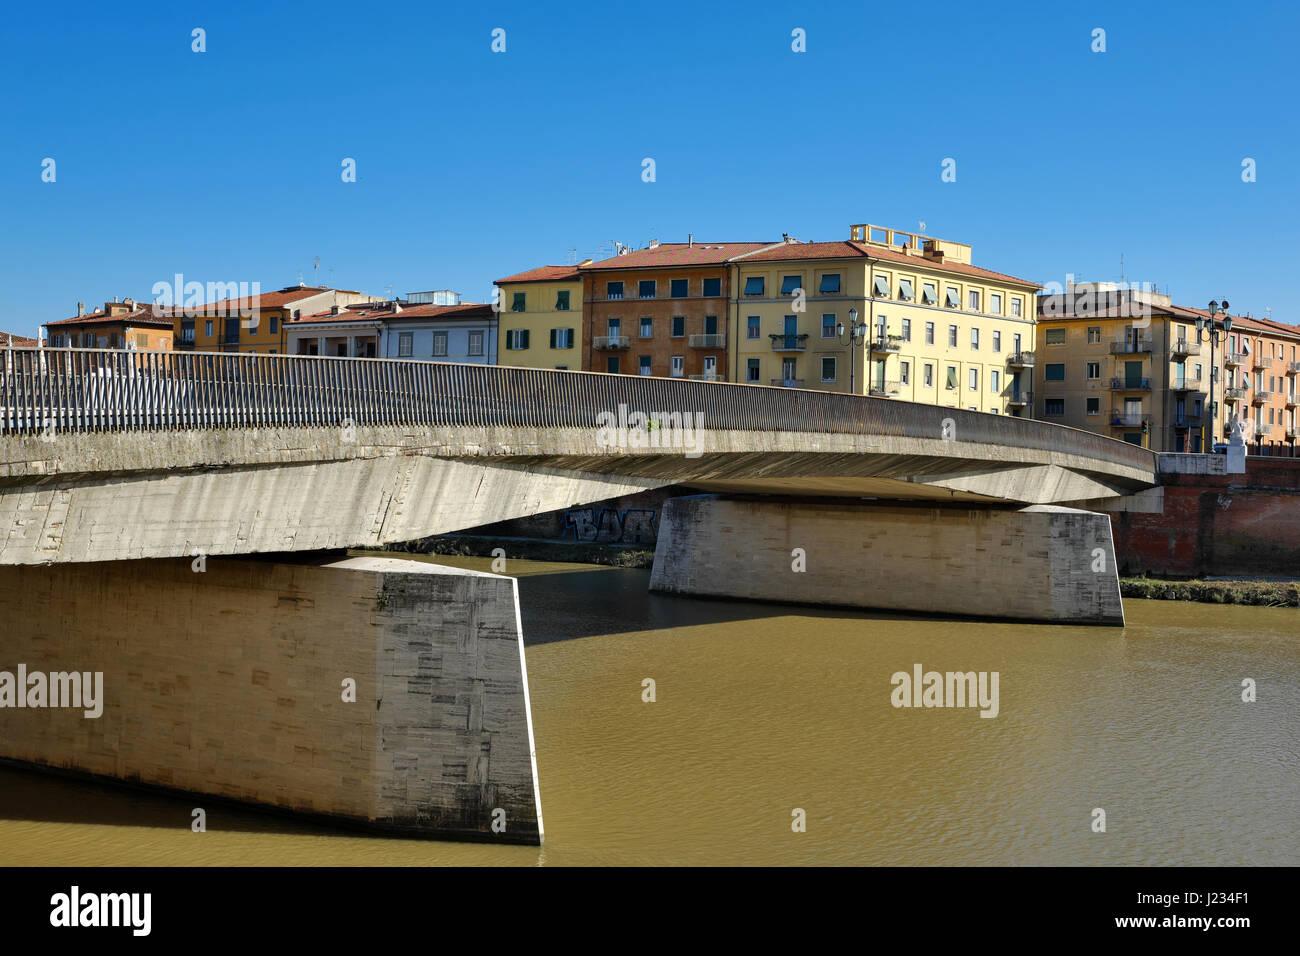 Angled view of Ponte Solferino Bridge on Arno River - Pisa, Tuscany, Italy, Europe - Stock Image